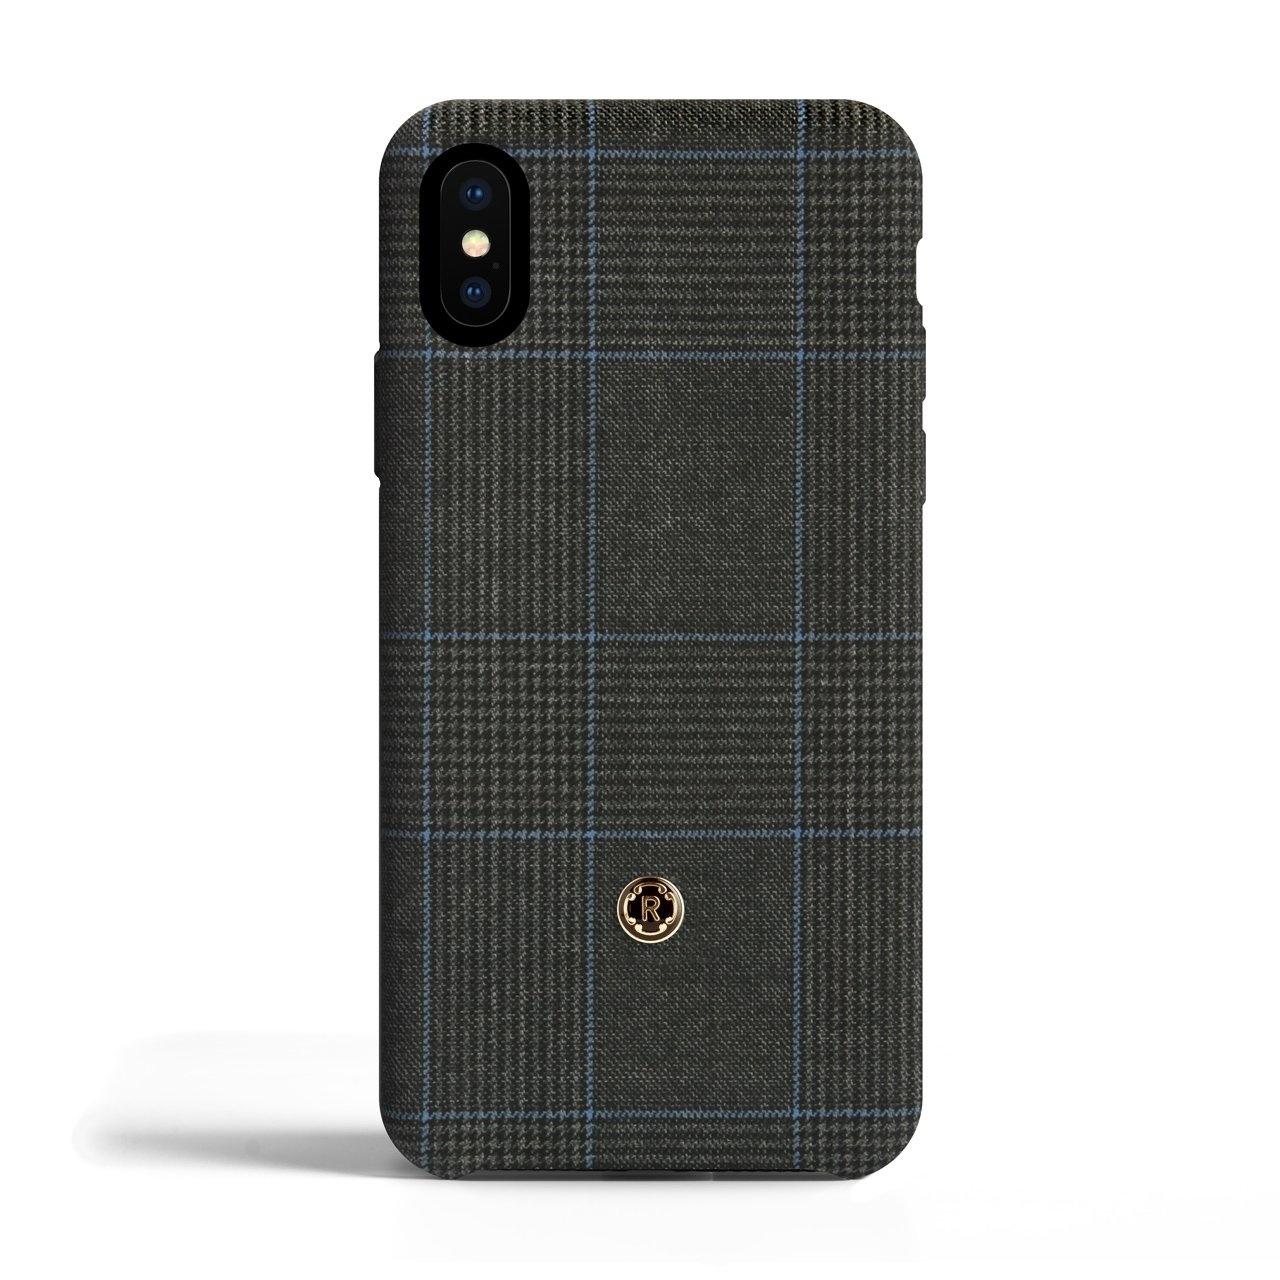 iPhone X / Xs Case - Prince of Wales Capri